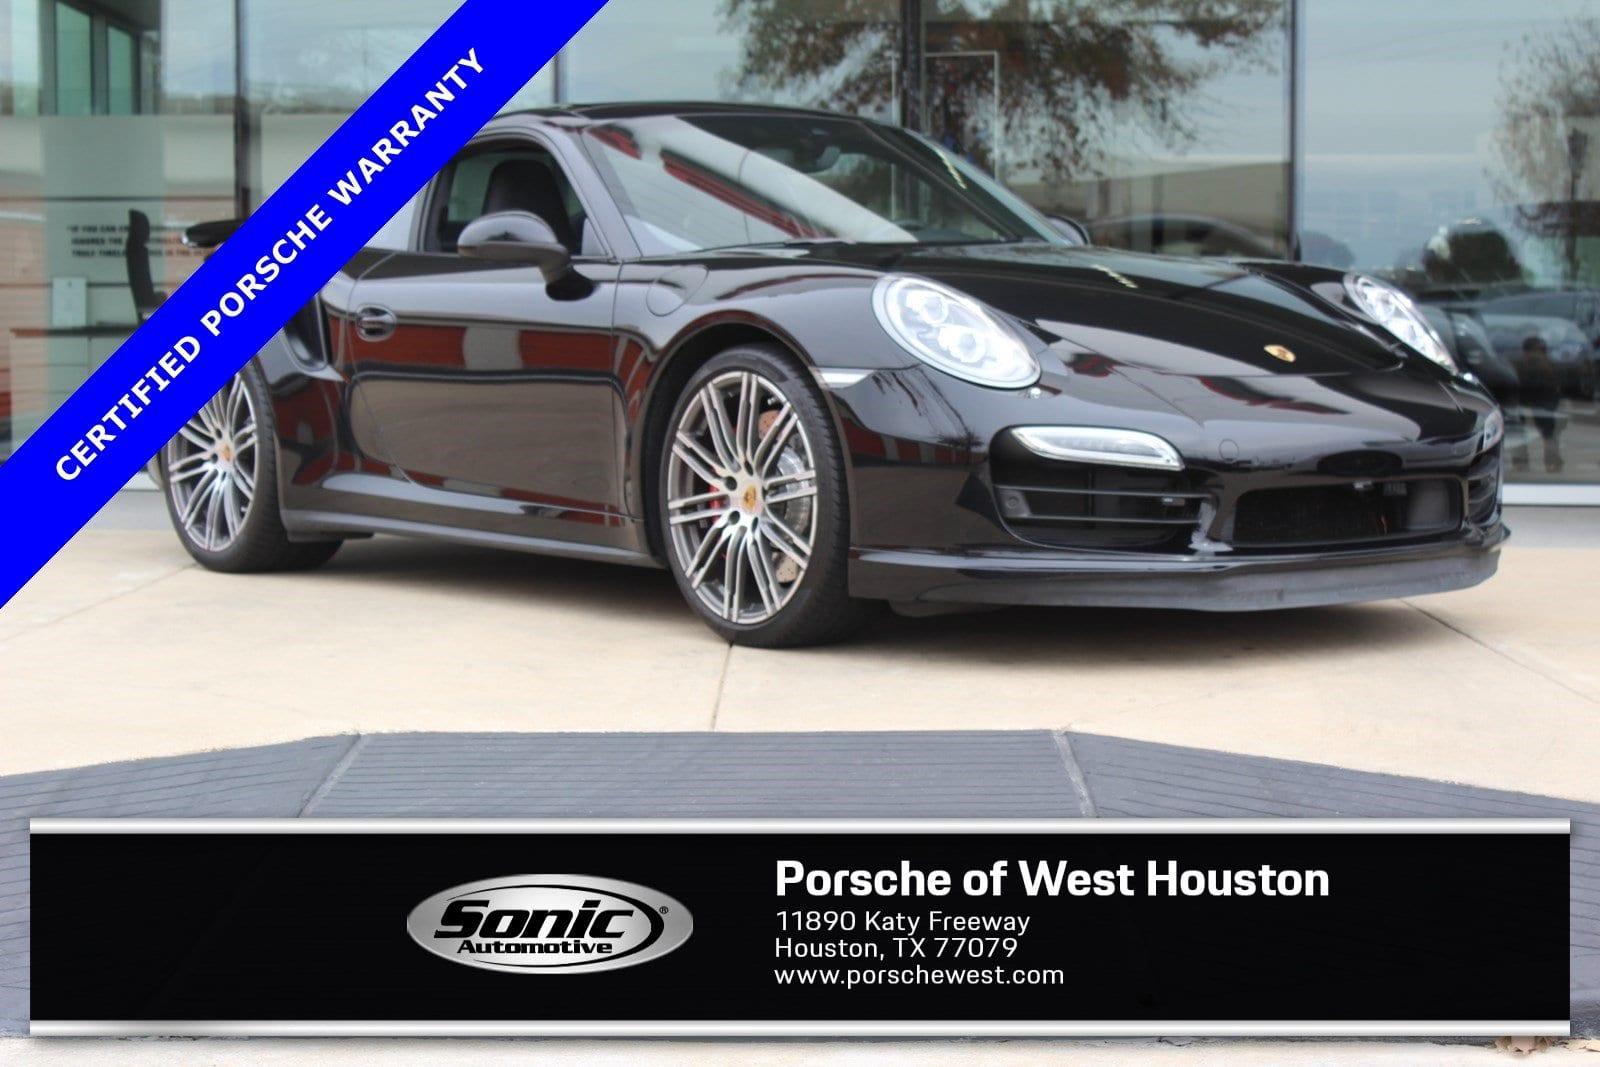 Photo 2015 Porsche 911 Turbo 2dr Cpe in Houston